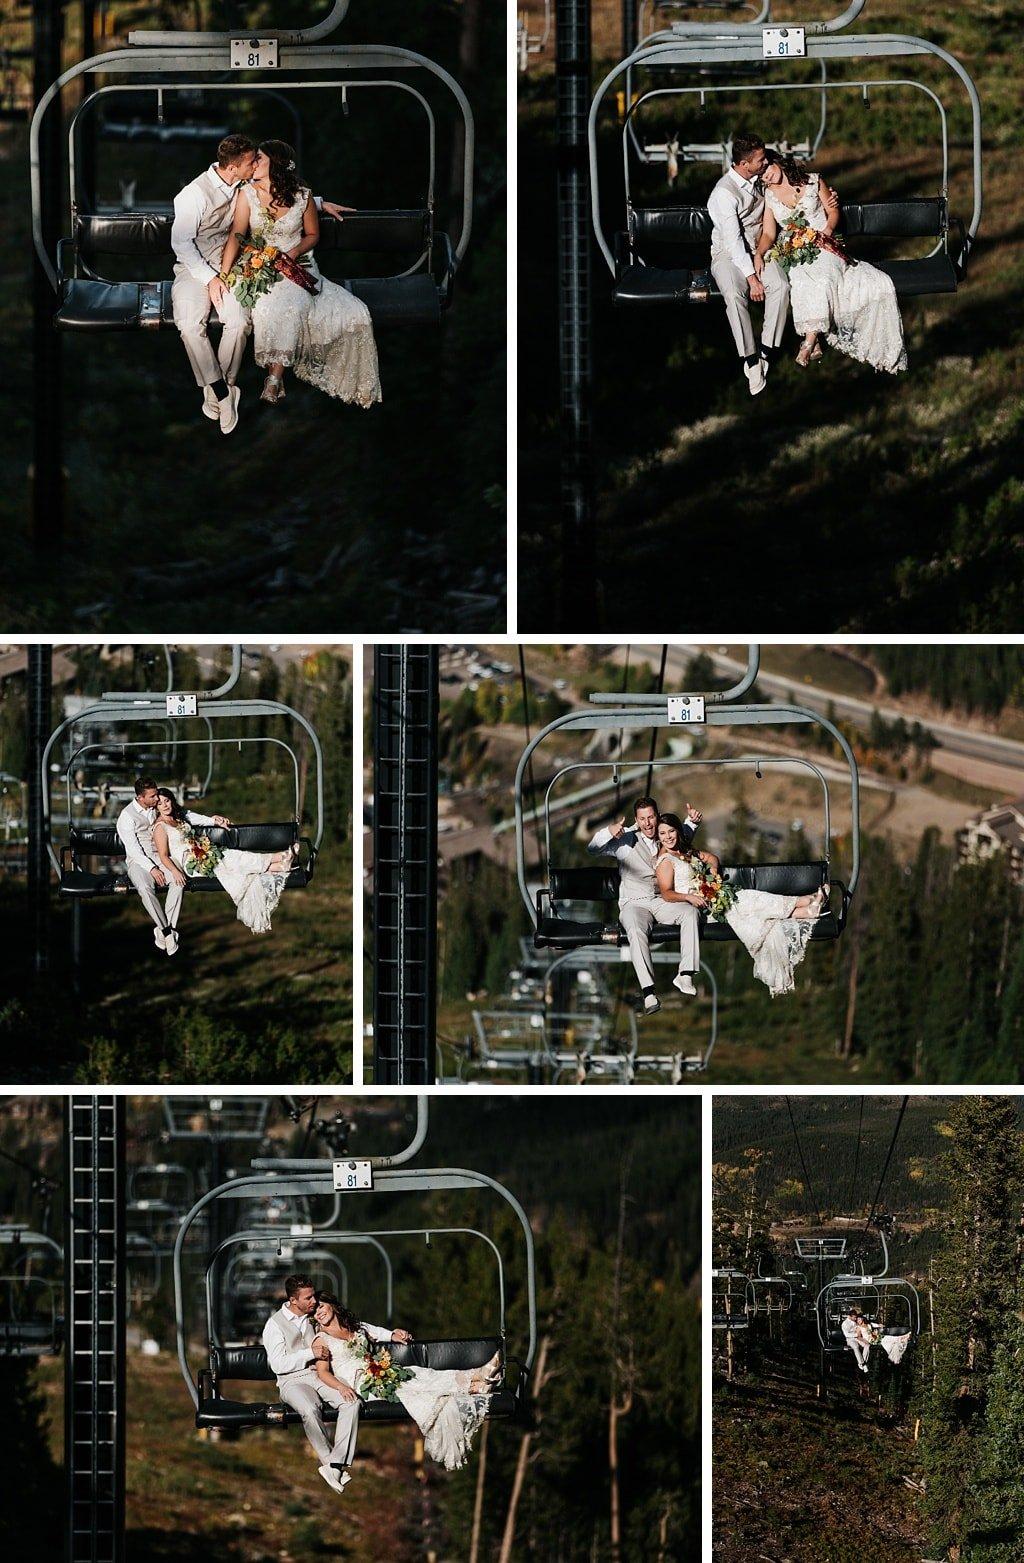 Sunspot Lodge Winter Park Resort Wedding bride and groom riding ski lift